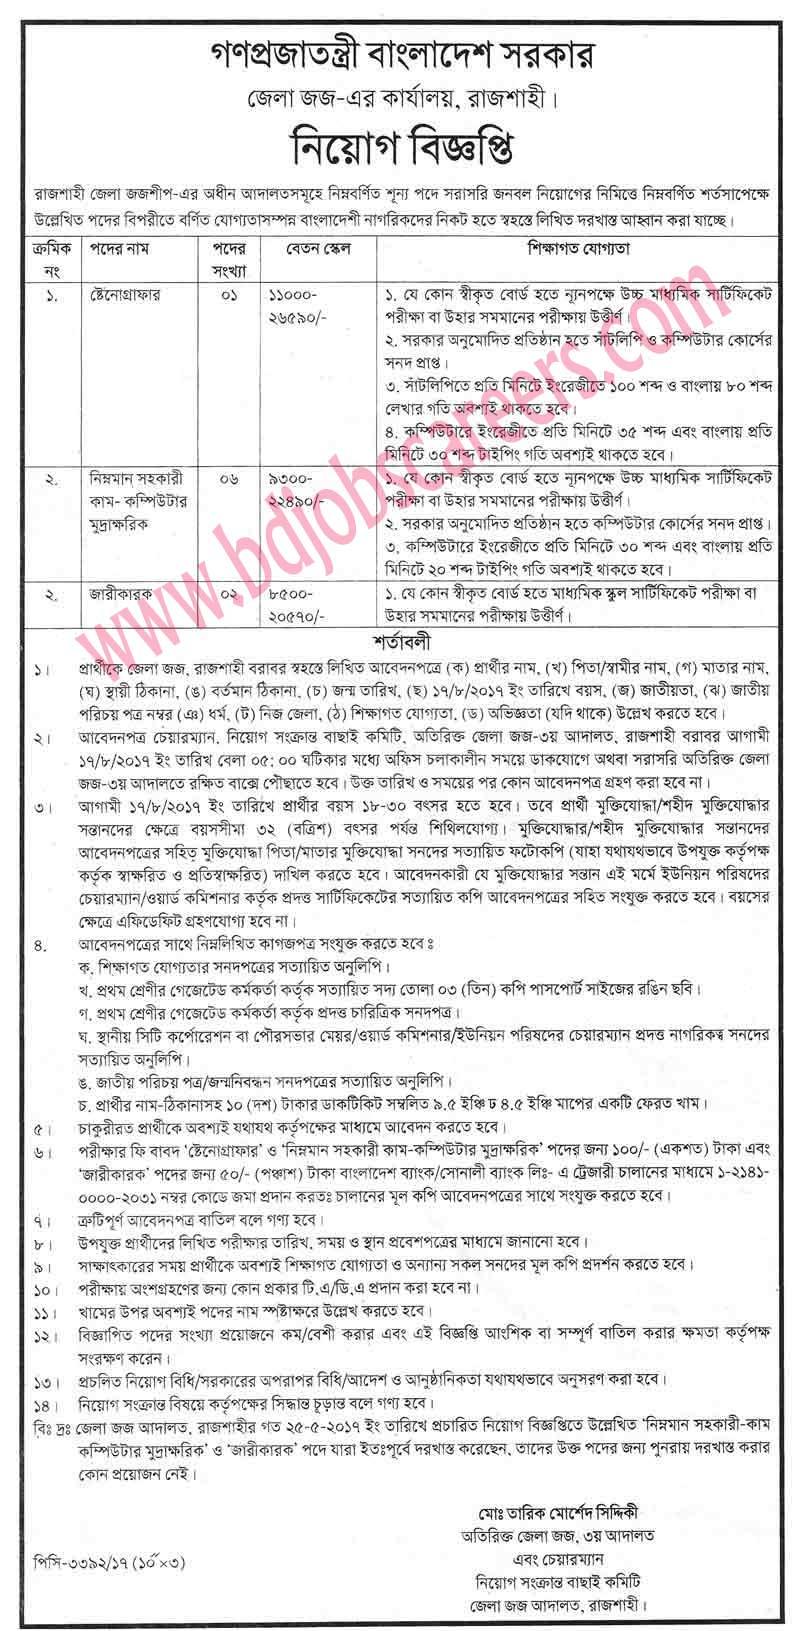 Rajshahi District Judge's Office Job Circular 2017